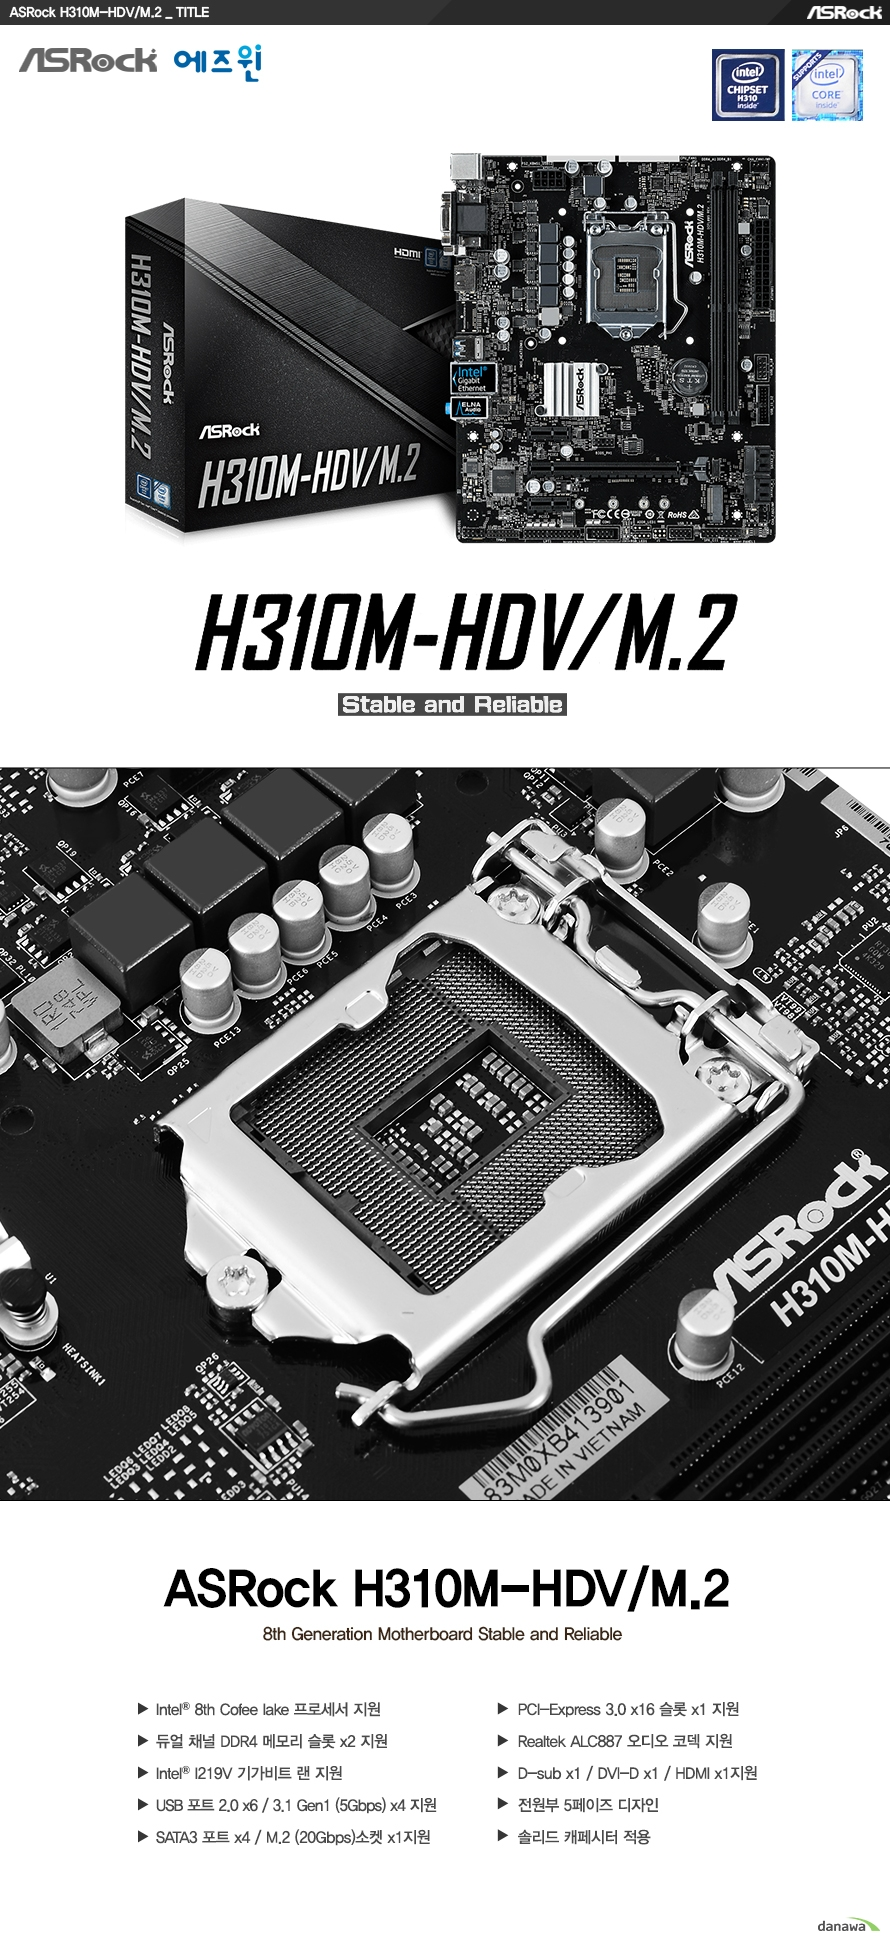 ASROCK H310M HDV M.2  8세대 인텔 프로세서 지원 (7세대 cpu 미지원) LGA1151소켓  인텔 H310 칩셋 지원  듀얼채널 DDR4 DIMM 메모리 2개 지원 최대 32GB 메모리 지원 DDR4 2666 2400 2133 NON ECC UN BUFFERED 메모리 지원 15마이크로 gold contact in dimm slot XMP 2.0 지원  PCIE 3.0 X16 슬롯 1개  PCIE 2.0 X1 슬롯 2개 Nvme ssd as boot disks 지원  7.1채널 ALC887 HD 오디오 코덱 지원  인텔 I219V 기가비트 랜 지원 랜 포트 낙뢰 및 정전기 보호 지원  SATA3 커넥터 4개 지원 M.2 20gbps 소켓 1개 지원 USB 3.0 4개 및 2.0 6개 지원  KC인증 R REM ASR H310MHDVM2  제조사의 사정에 따라 사전고지 없이 일부 제품사양이 변경될 수 있습니다. 구매 전 파워 서플라이의 CPU 프로세서 지원 여부를 확인하시기 바랍니다.  제품 구성   사용자 설명서 드라이버 CD IO쉴드 및 SATA3케이블  최고의 고객 만족을 위하여 에즈윈에서는 3년 무상 품질 보증 서비스를 제공합니다.